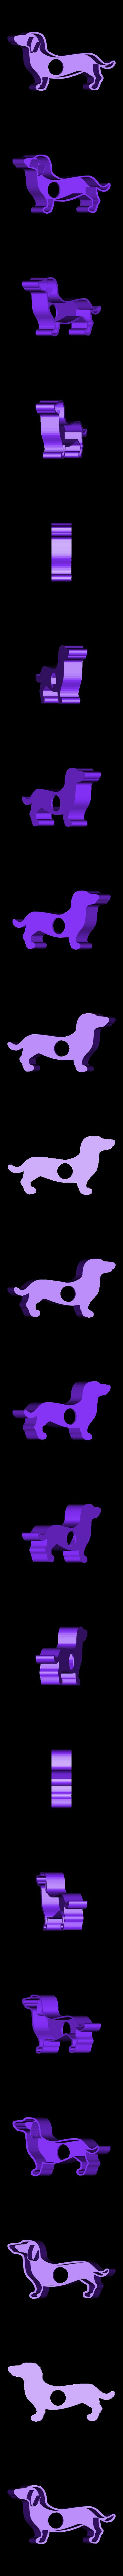 Dachshund.stl Download free STL file Dachshund Cookie Cutter • 3D printer template, bromego